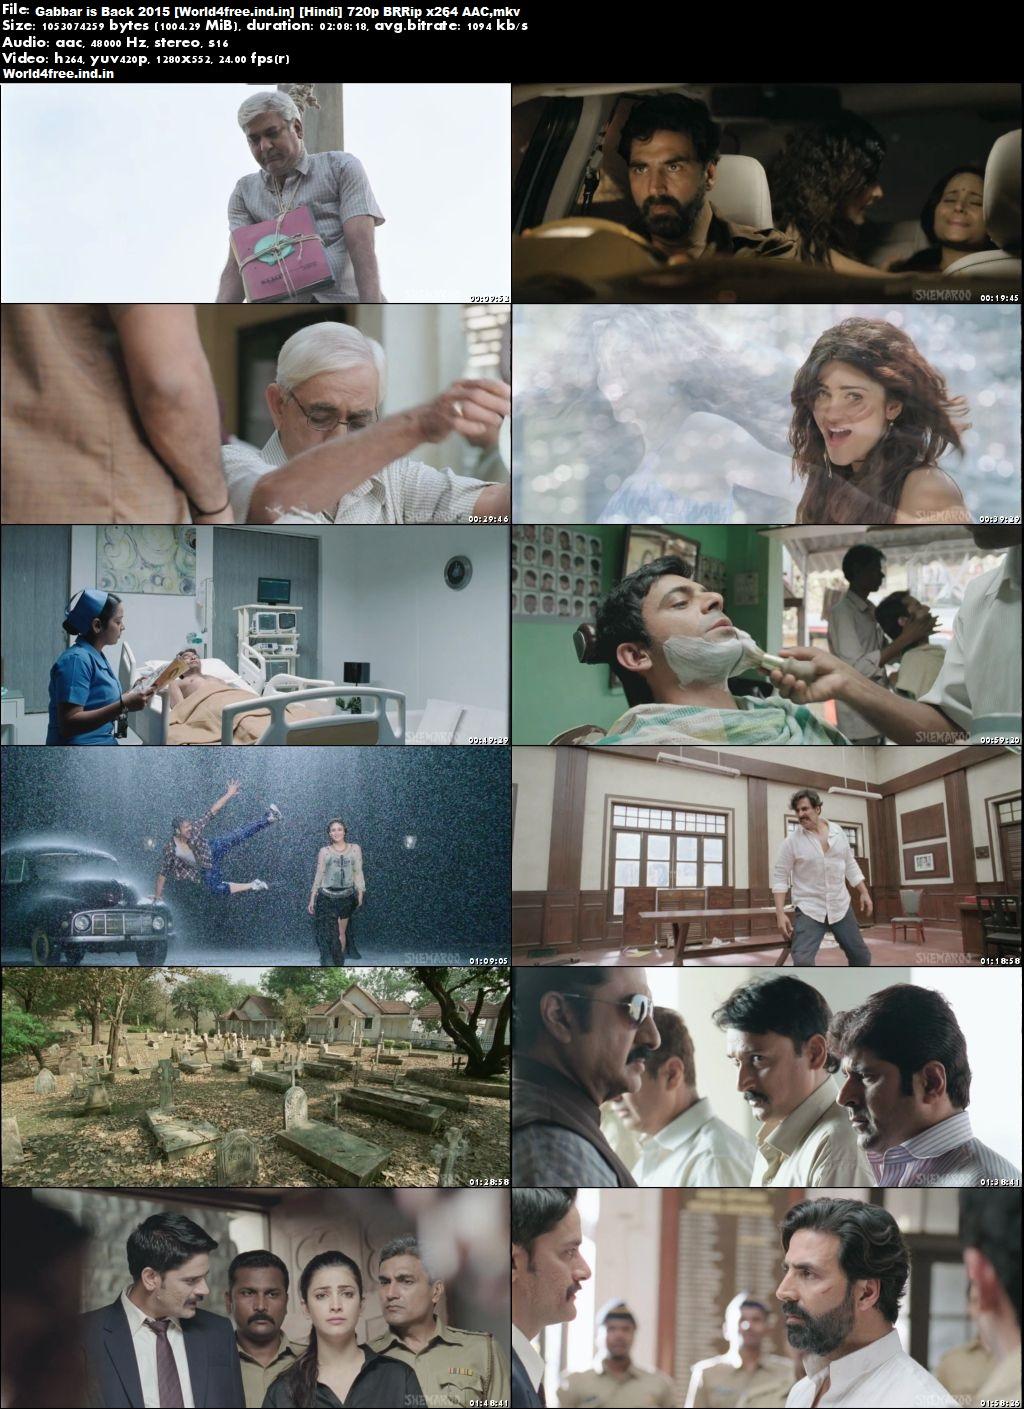 Gabbar is Back 2015 world4free.ind.in Full BRRip 720p Hindi Movie Download